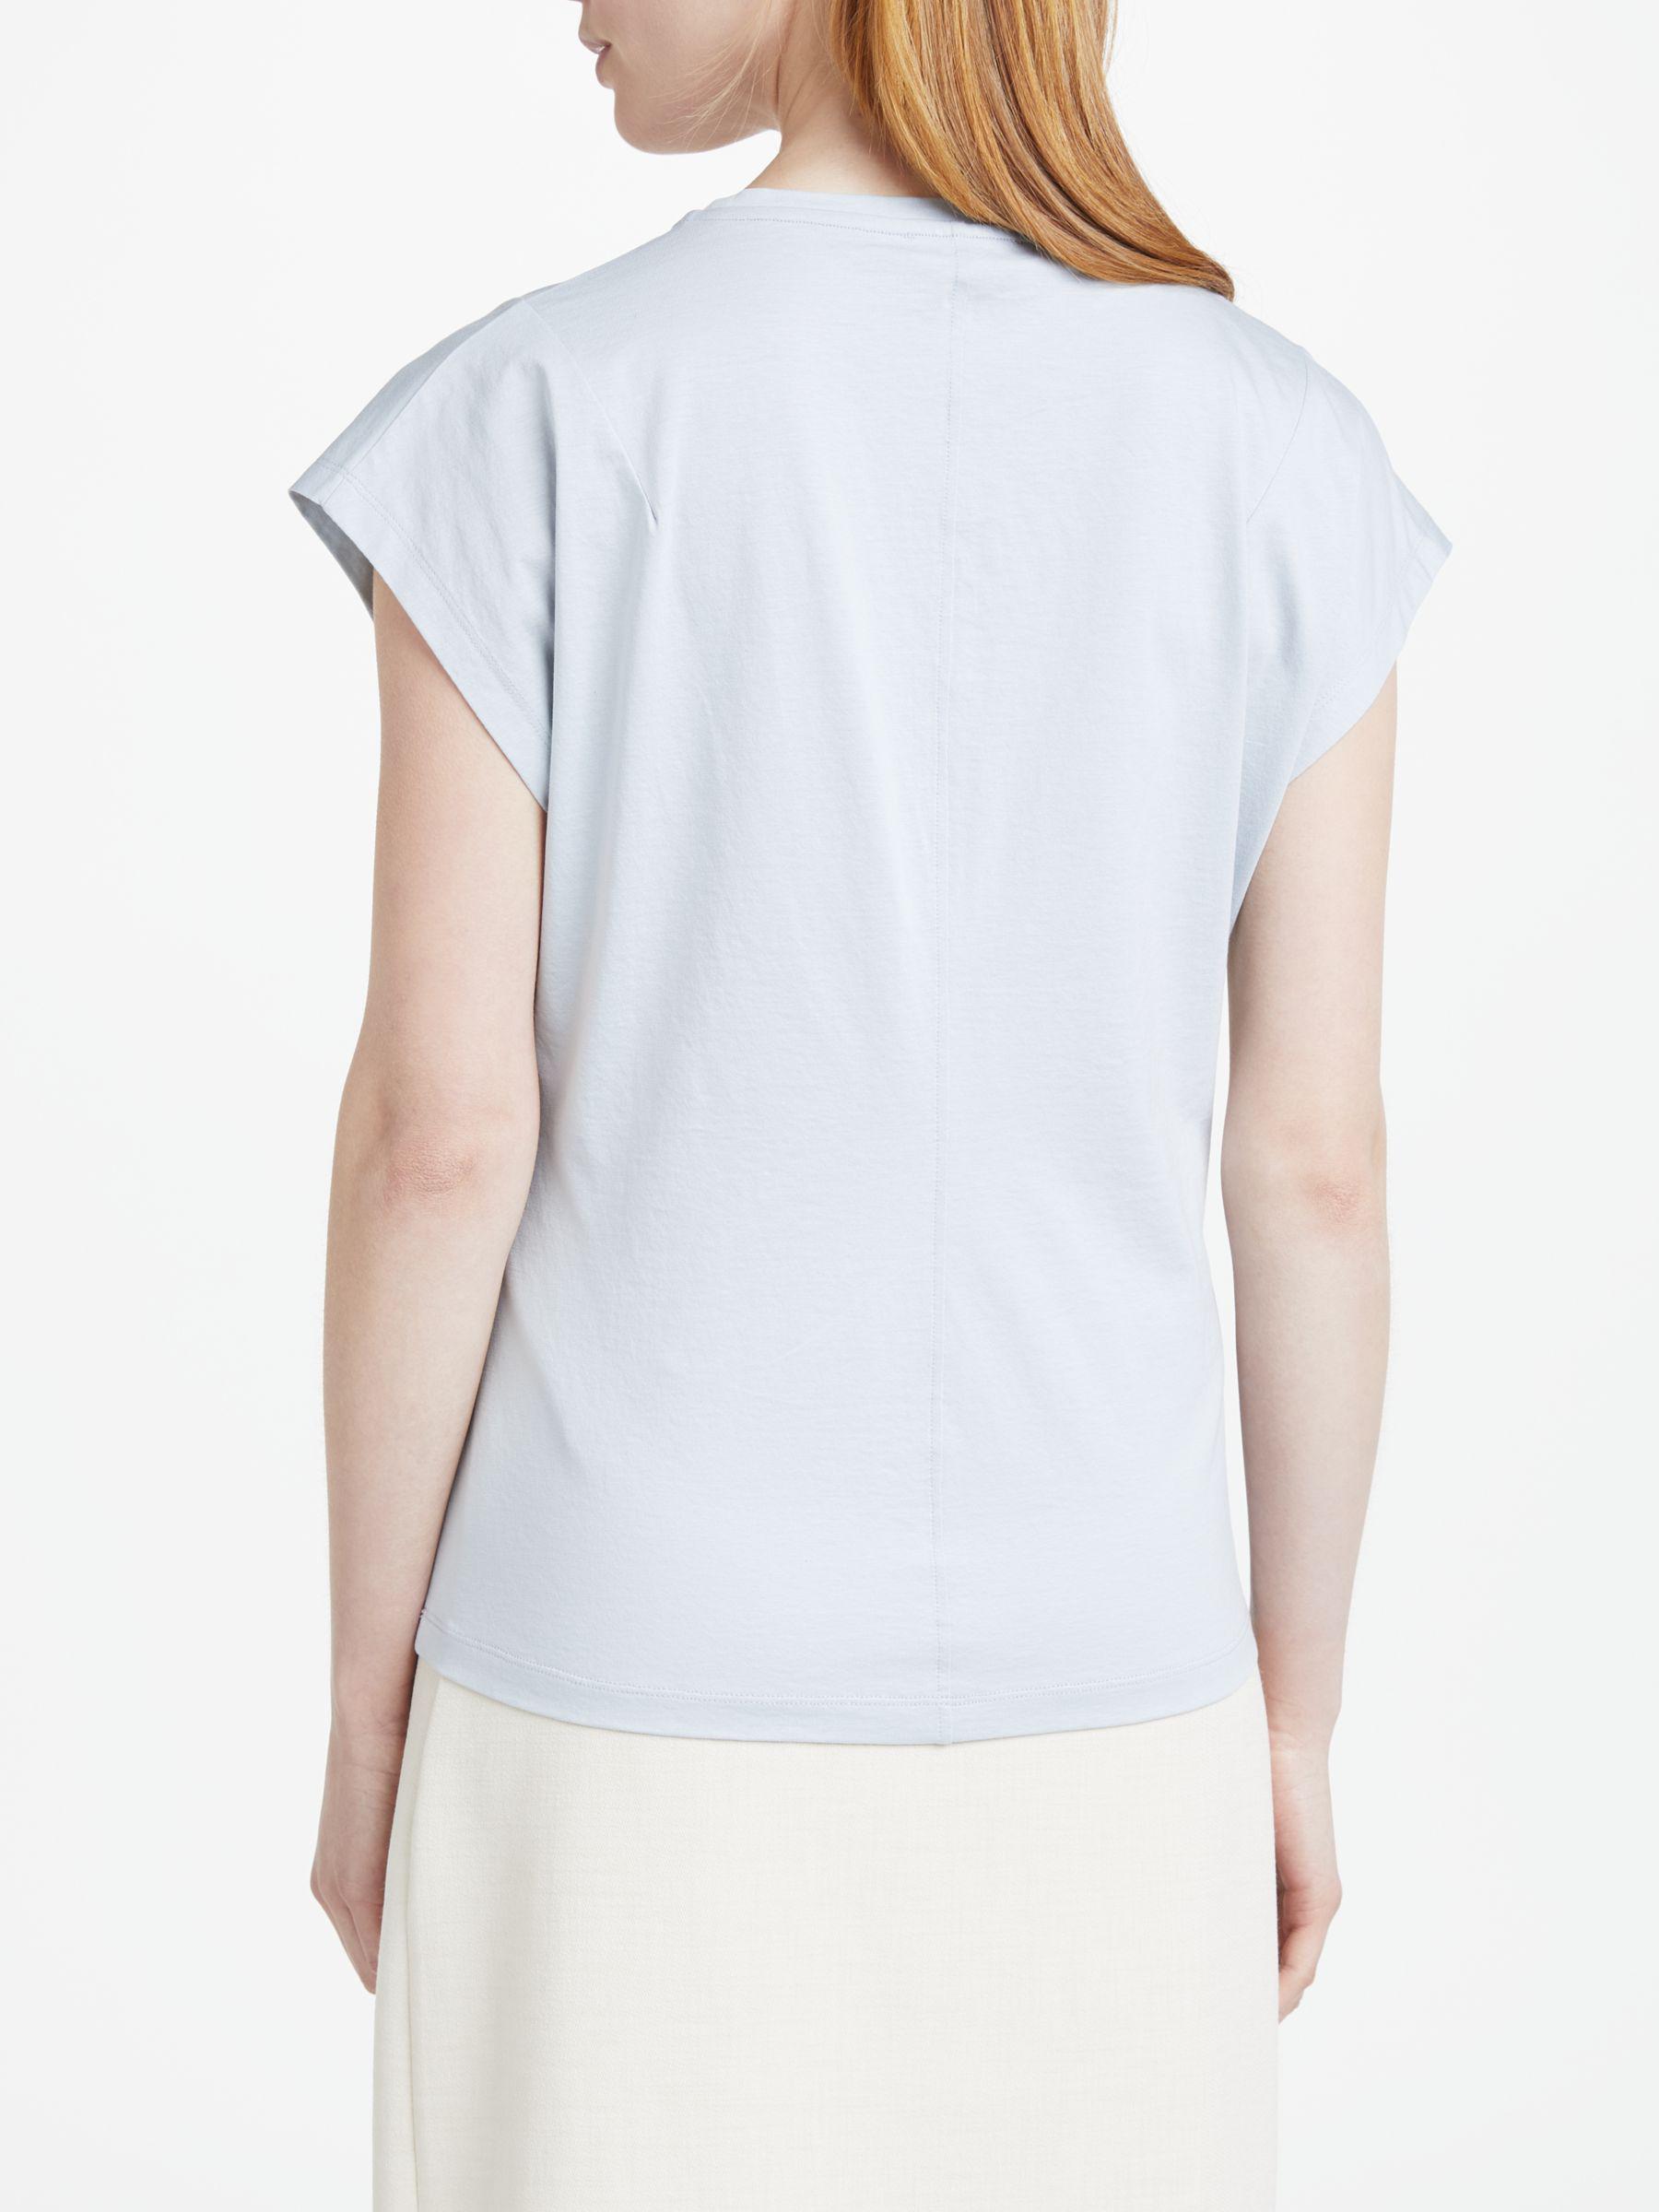 Finery London Sherborne T-Shirt Discount Hot Sale btJsw